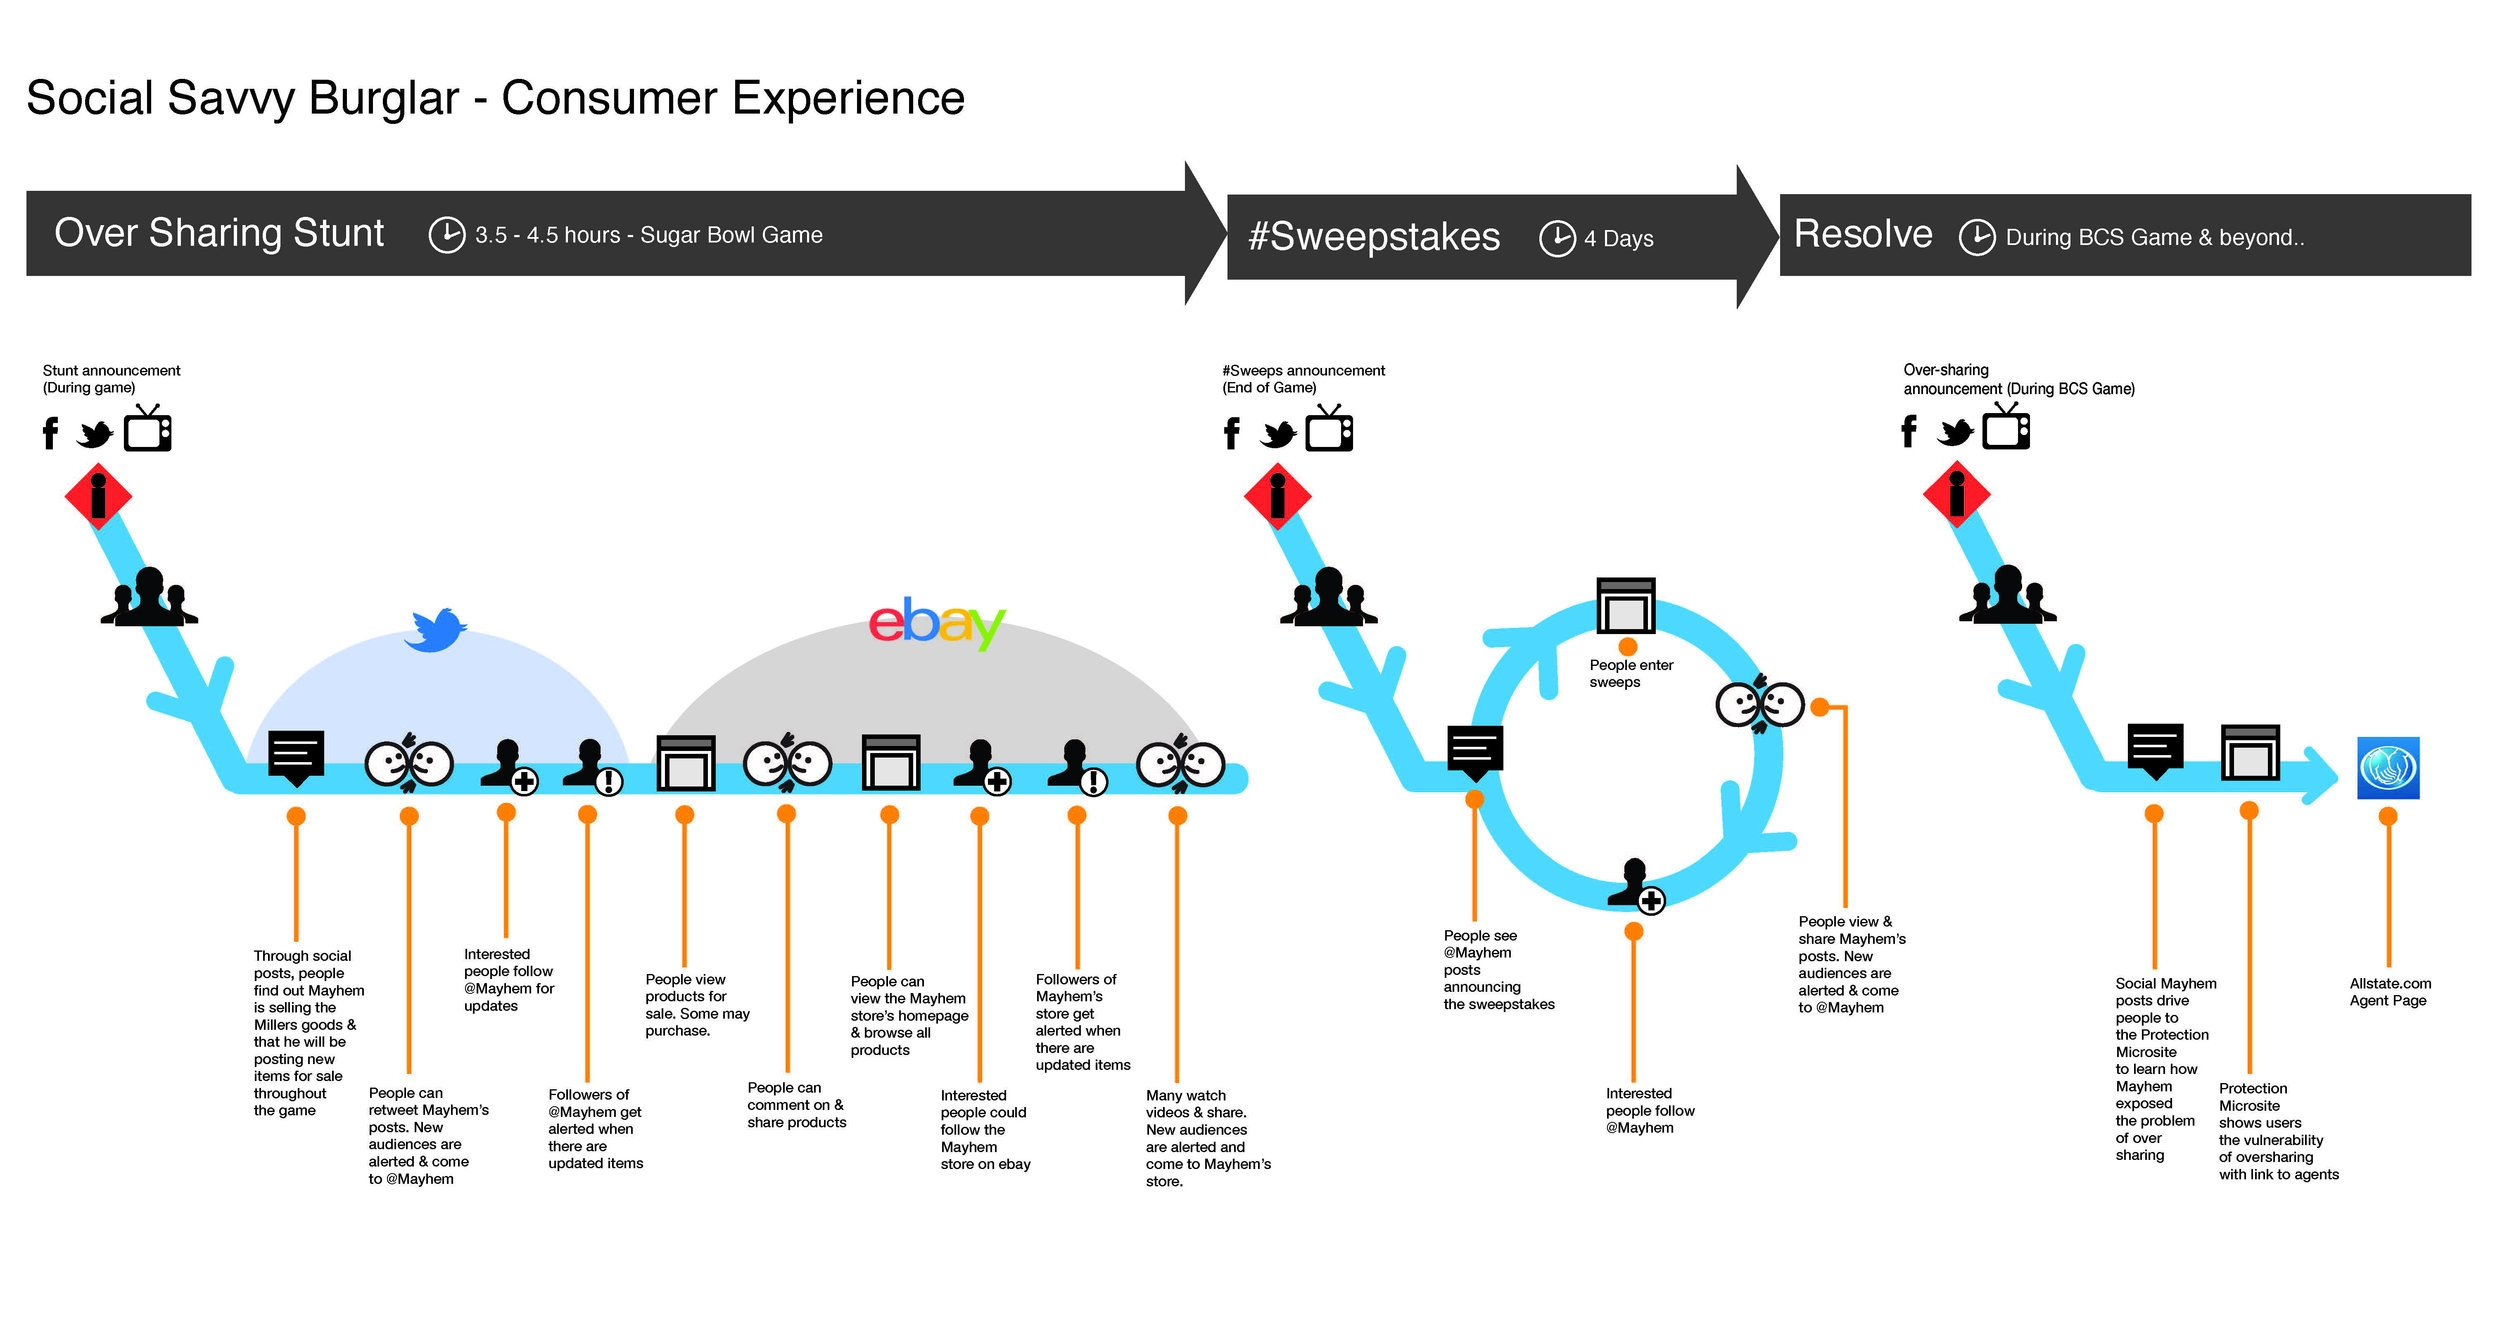 SSB-ConsumerExperienceV4.jpg